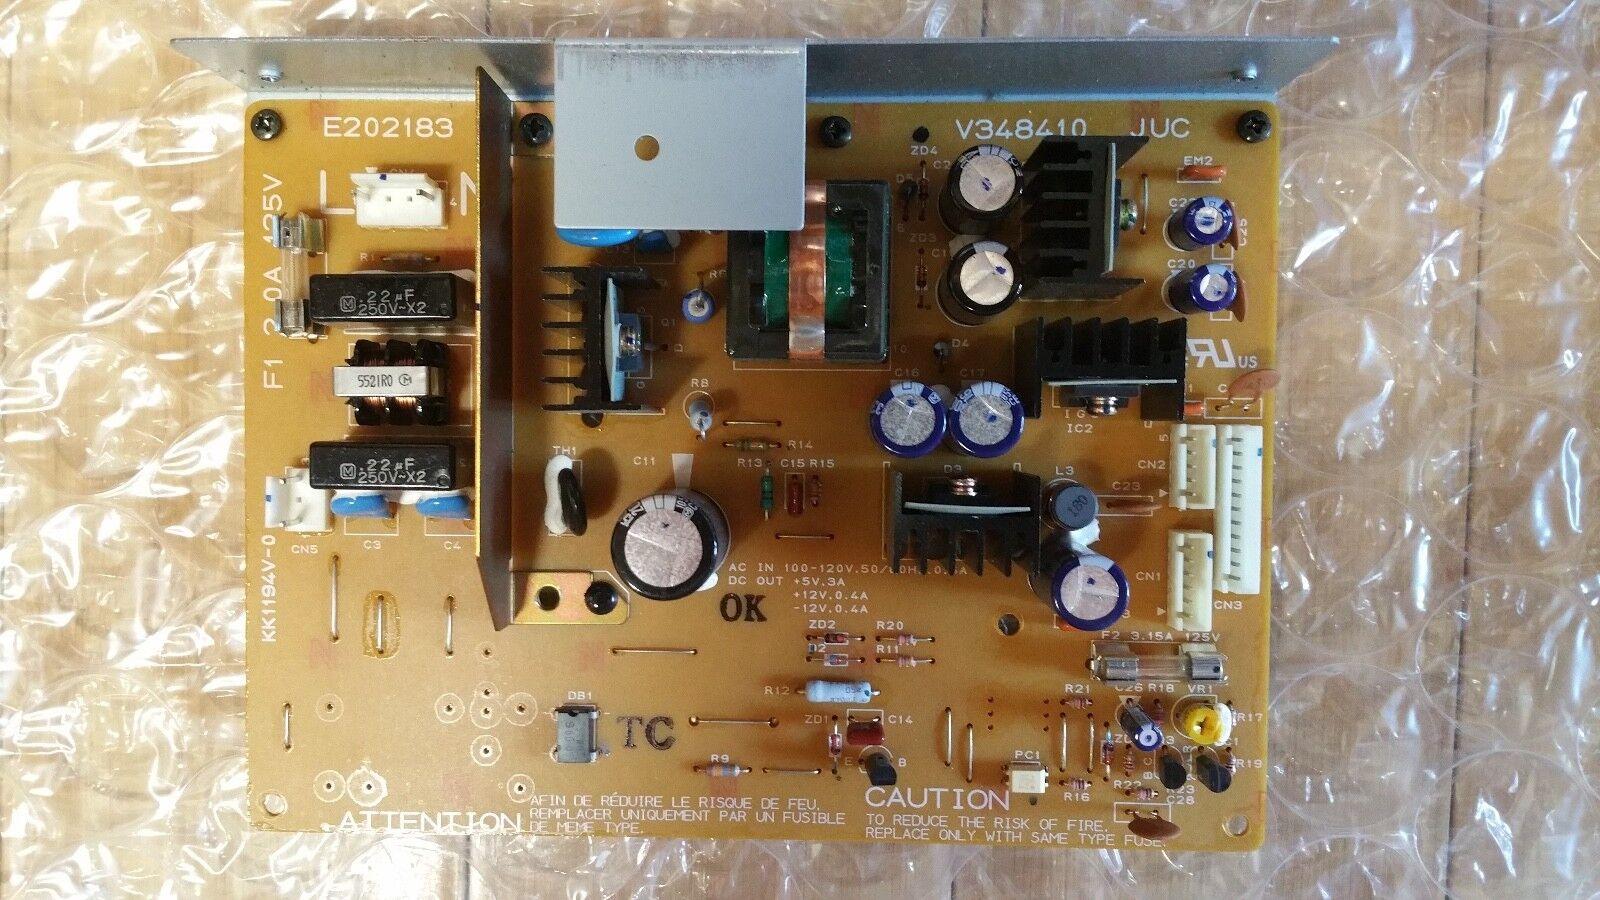 Yamaha S80 E202183 panel V348410 JUC kk1194V-0 panel YFBU25091A